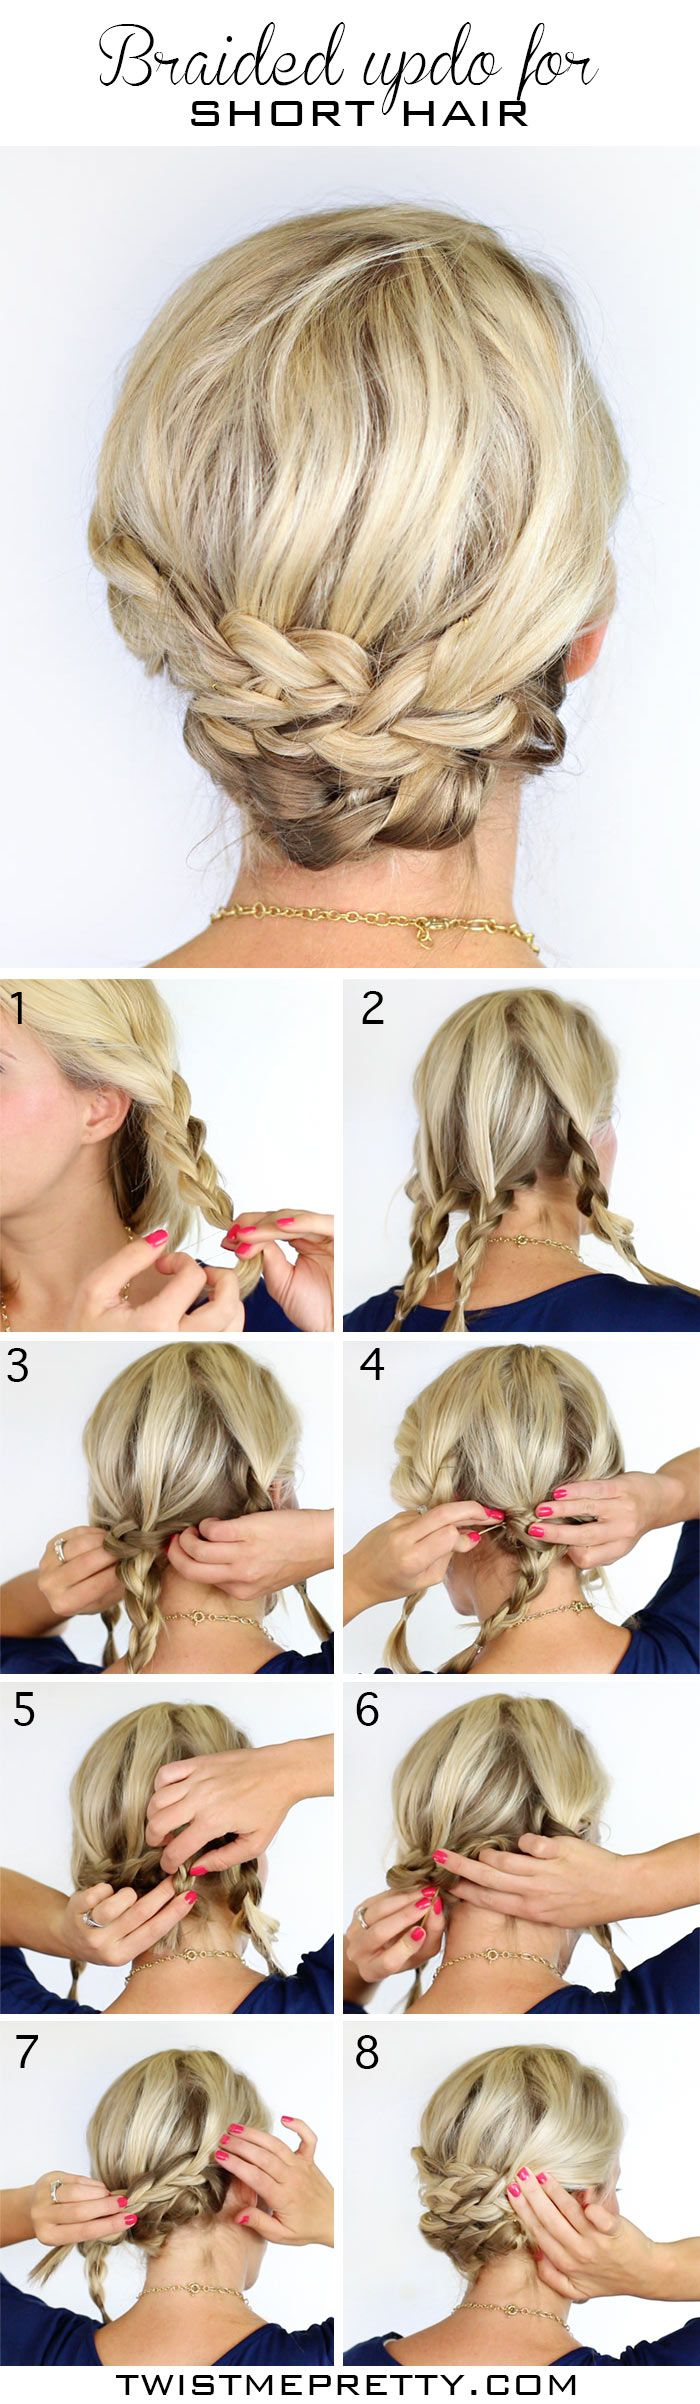 Prime 1000 Ideas About Braid Short Hair On Pinterest Highlighted Hair Short Hairstyles For Black Women Fulllsitofus